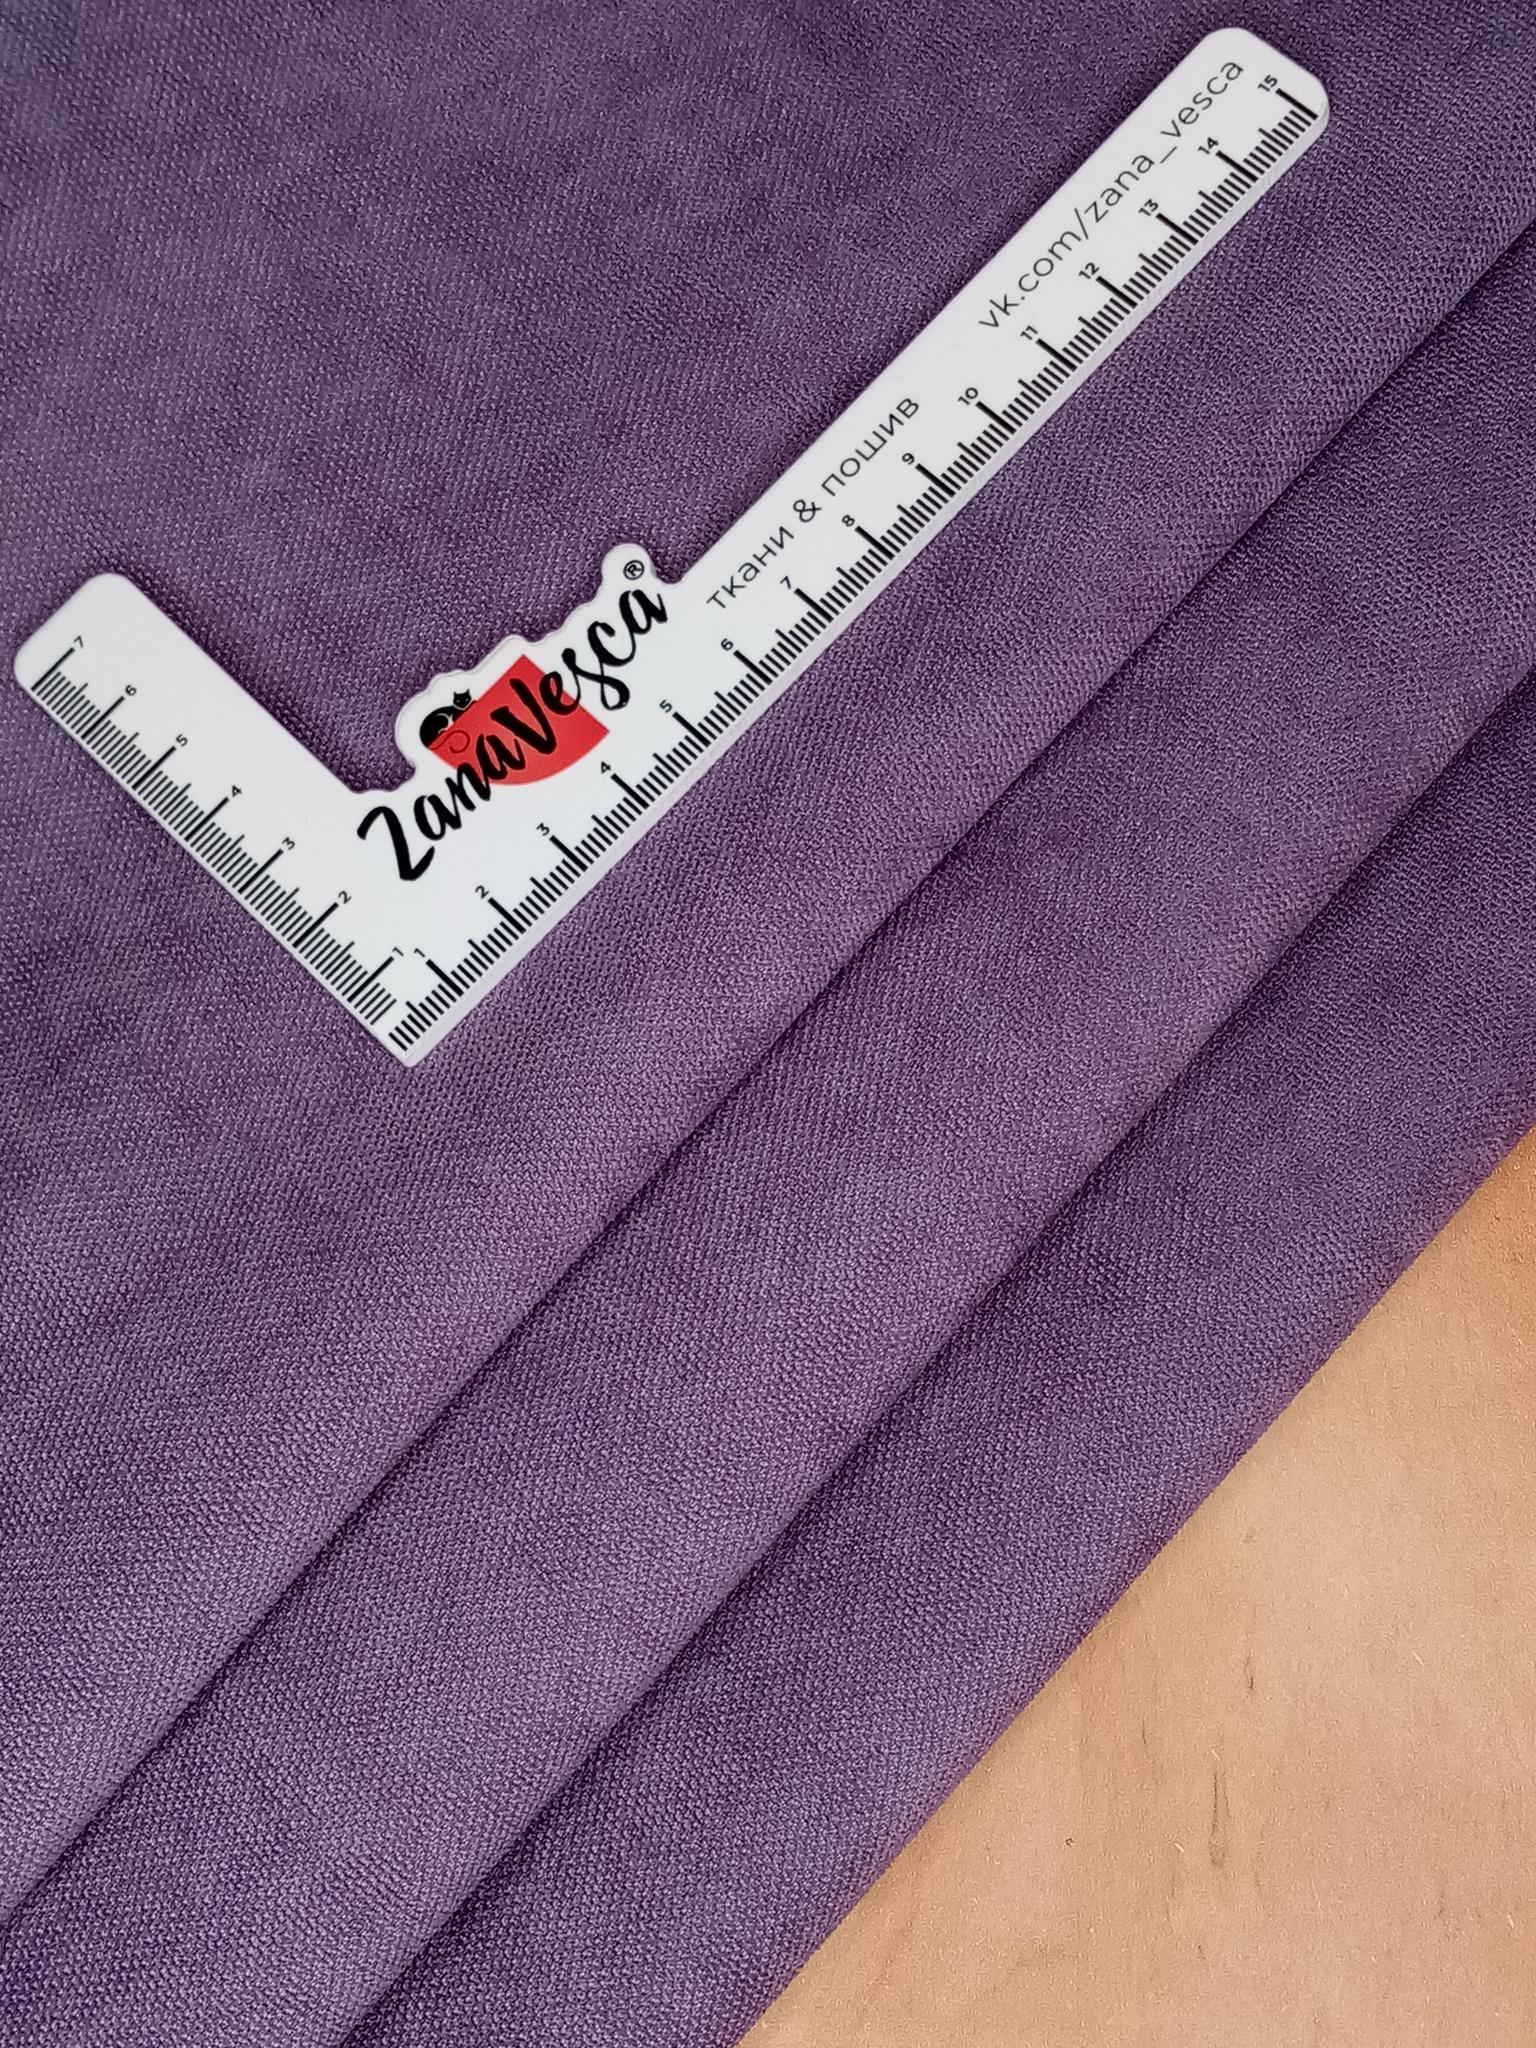 Канвас-велюр Королевский пурпурный